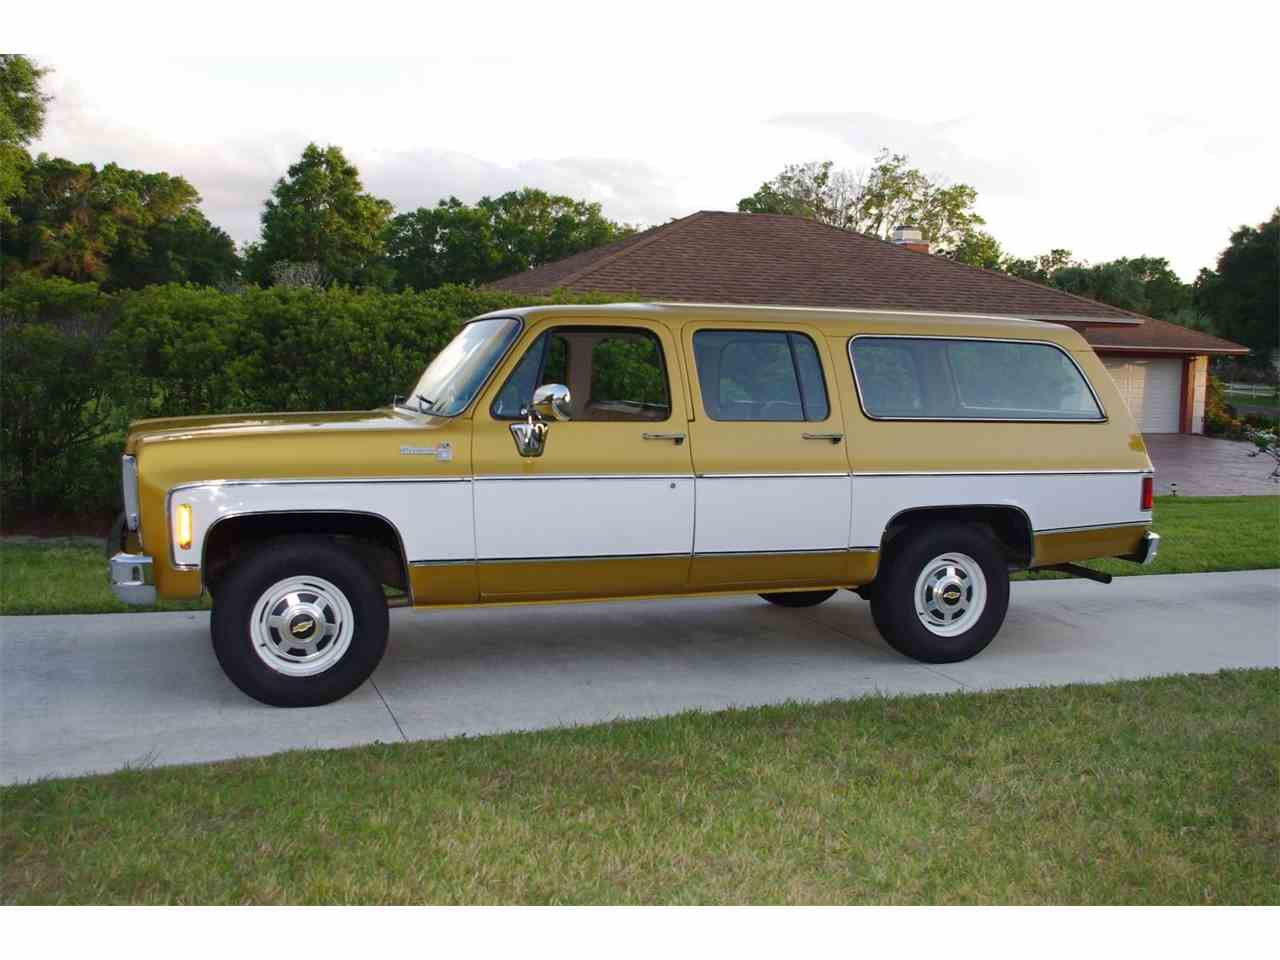 1975 Chevrolet Suburban for Sale | ClassicCars.com | CC-993656